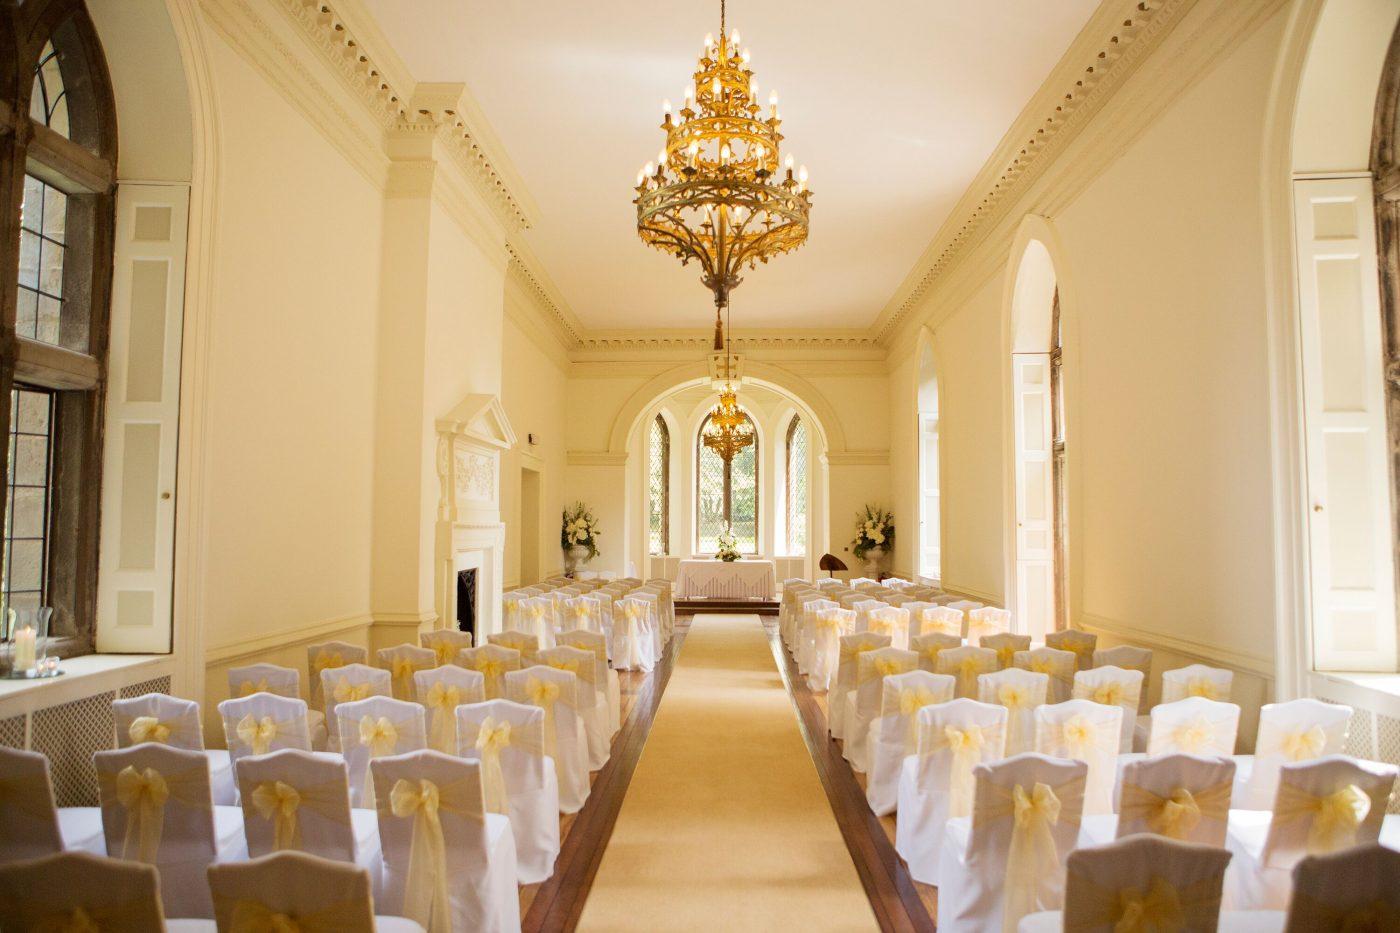 Clearwell Castle Wedding Venue